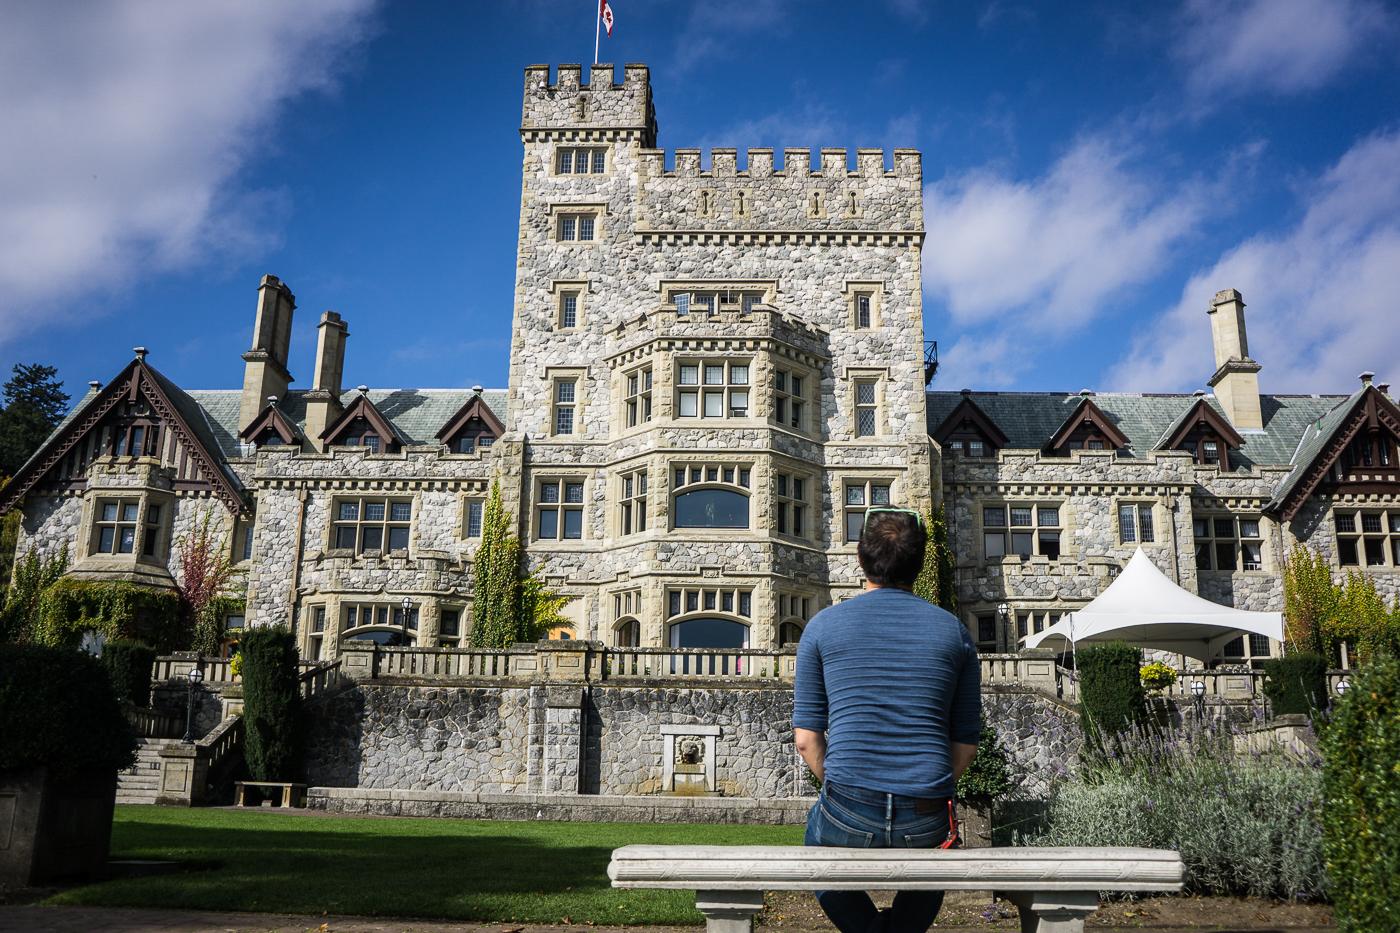 Ian at Hatley Castle, Victoria, British Columbia